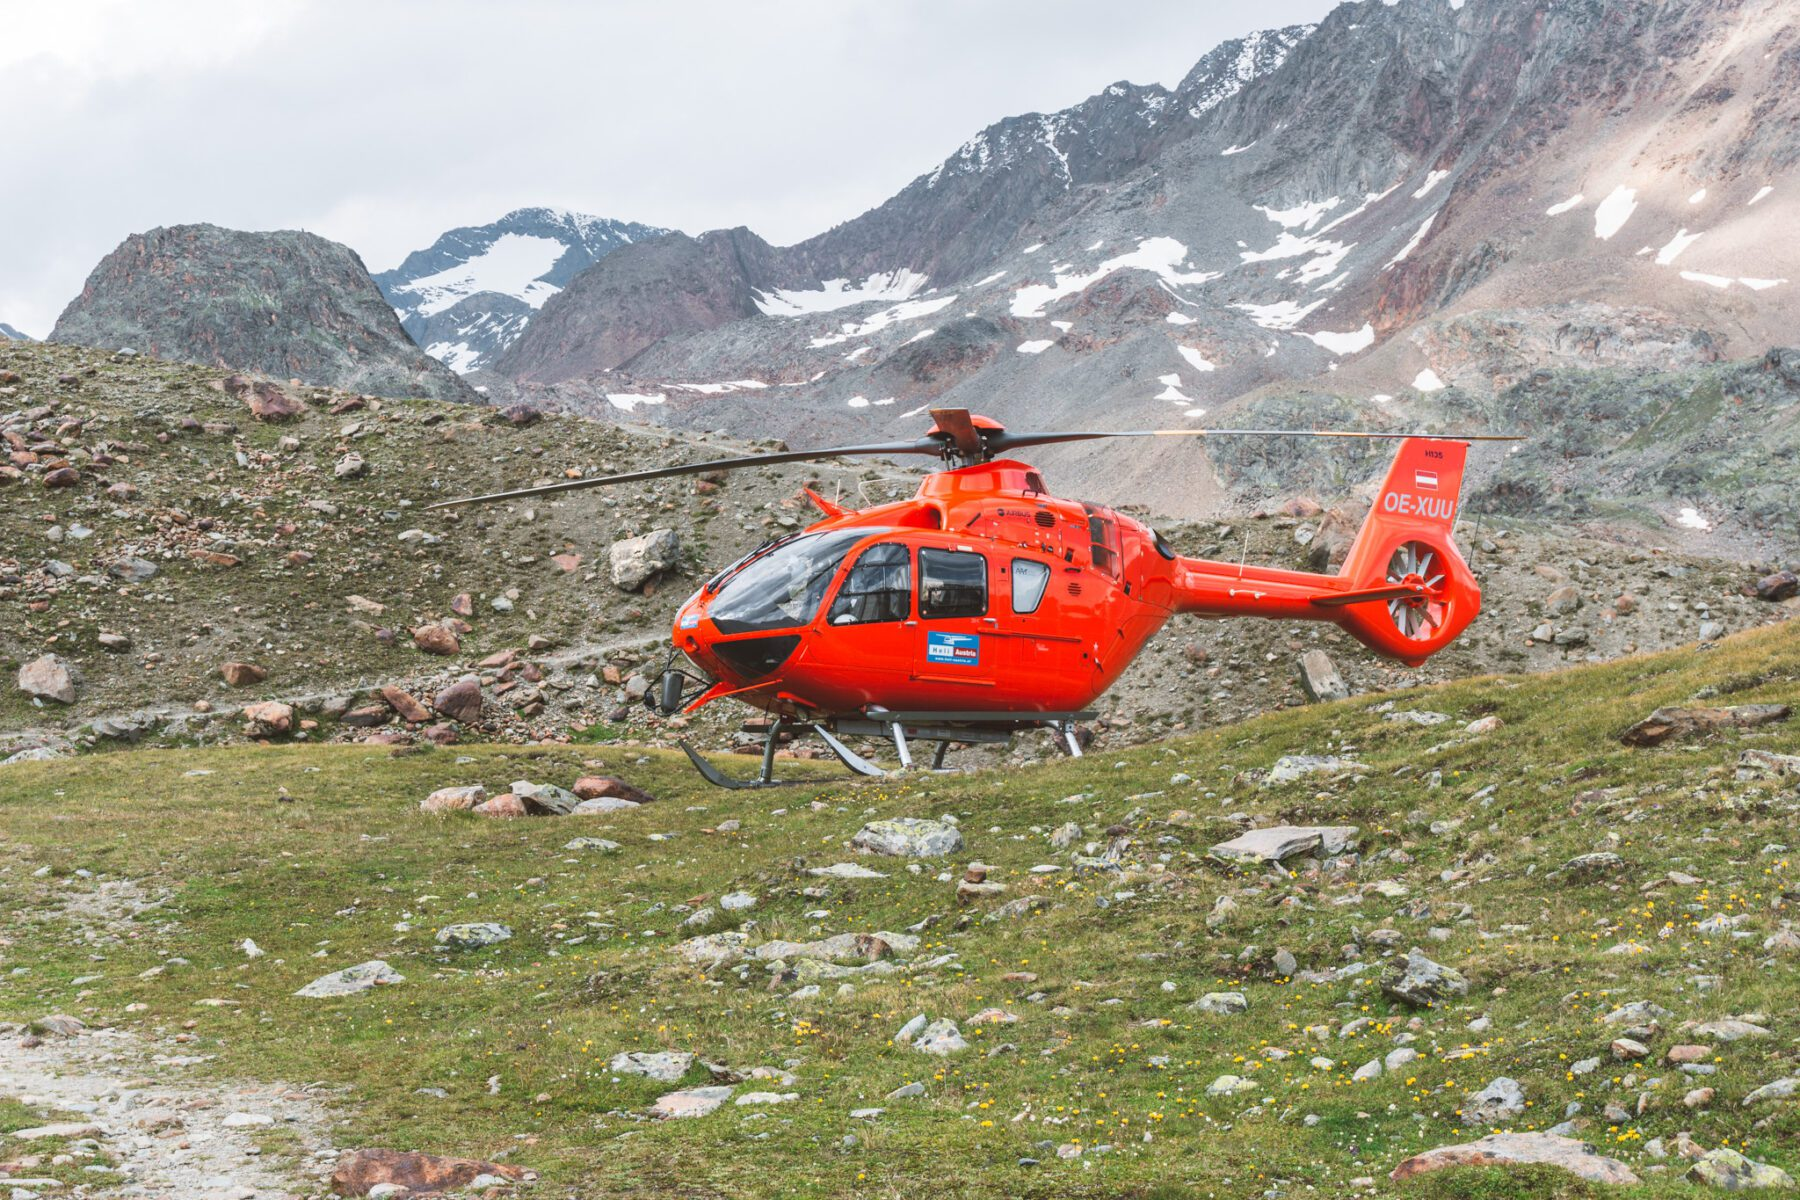 NKBV C1 cursus helicopter